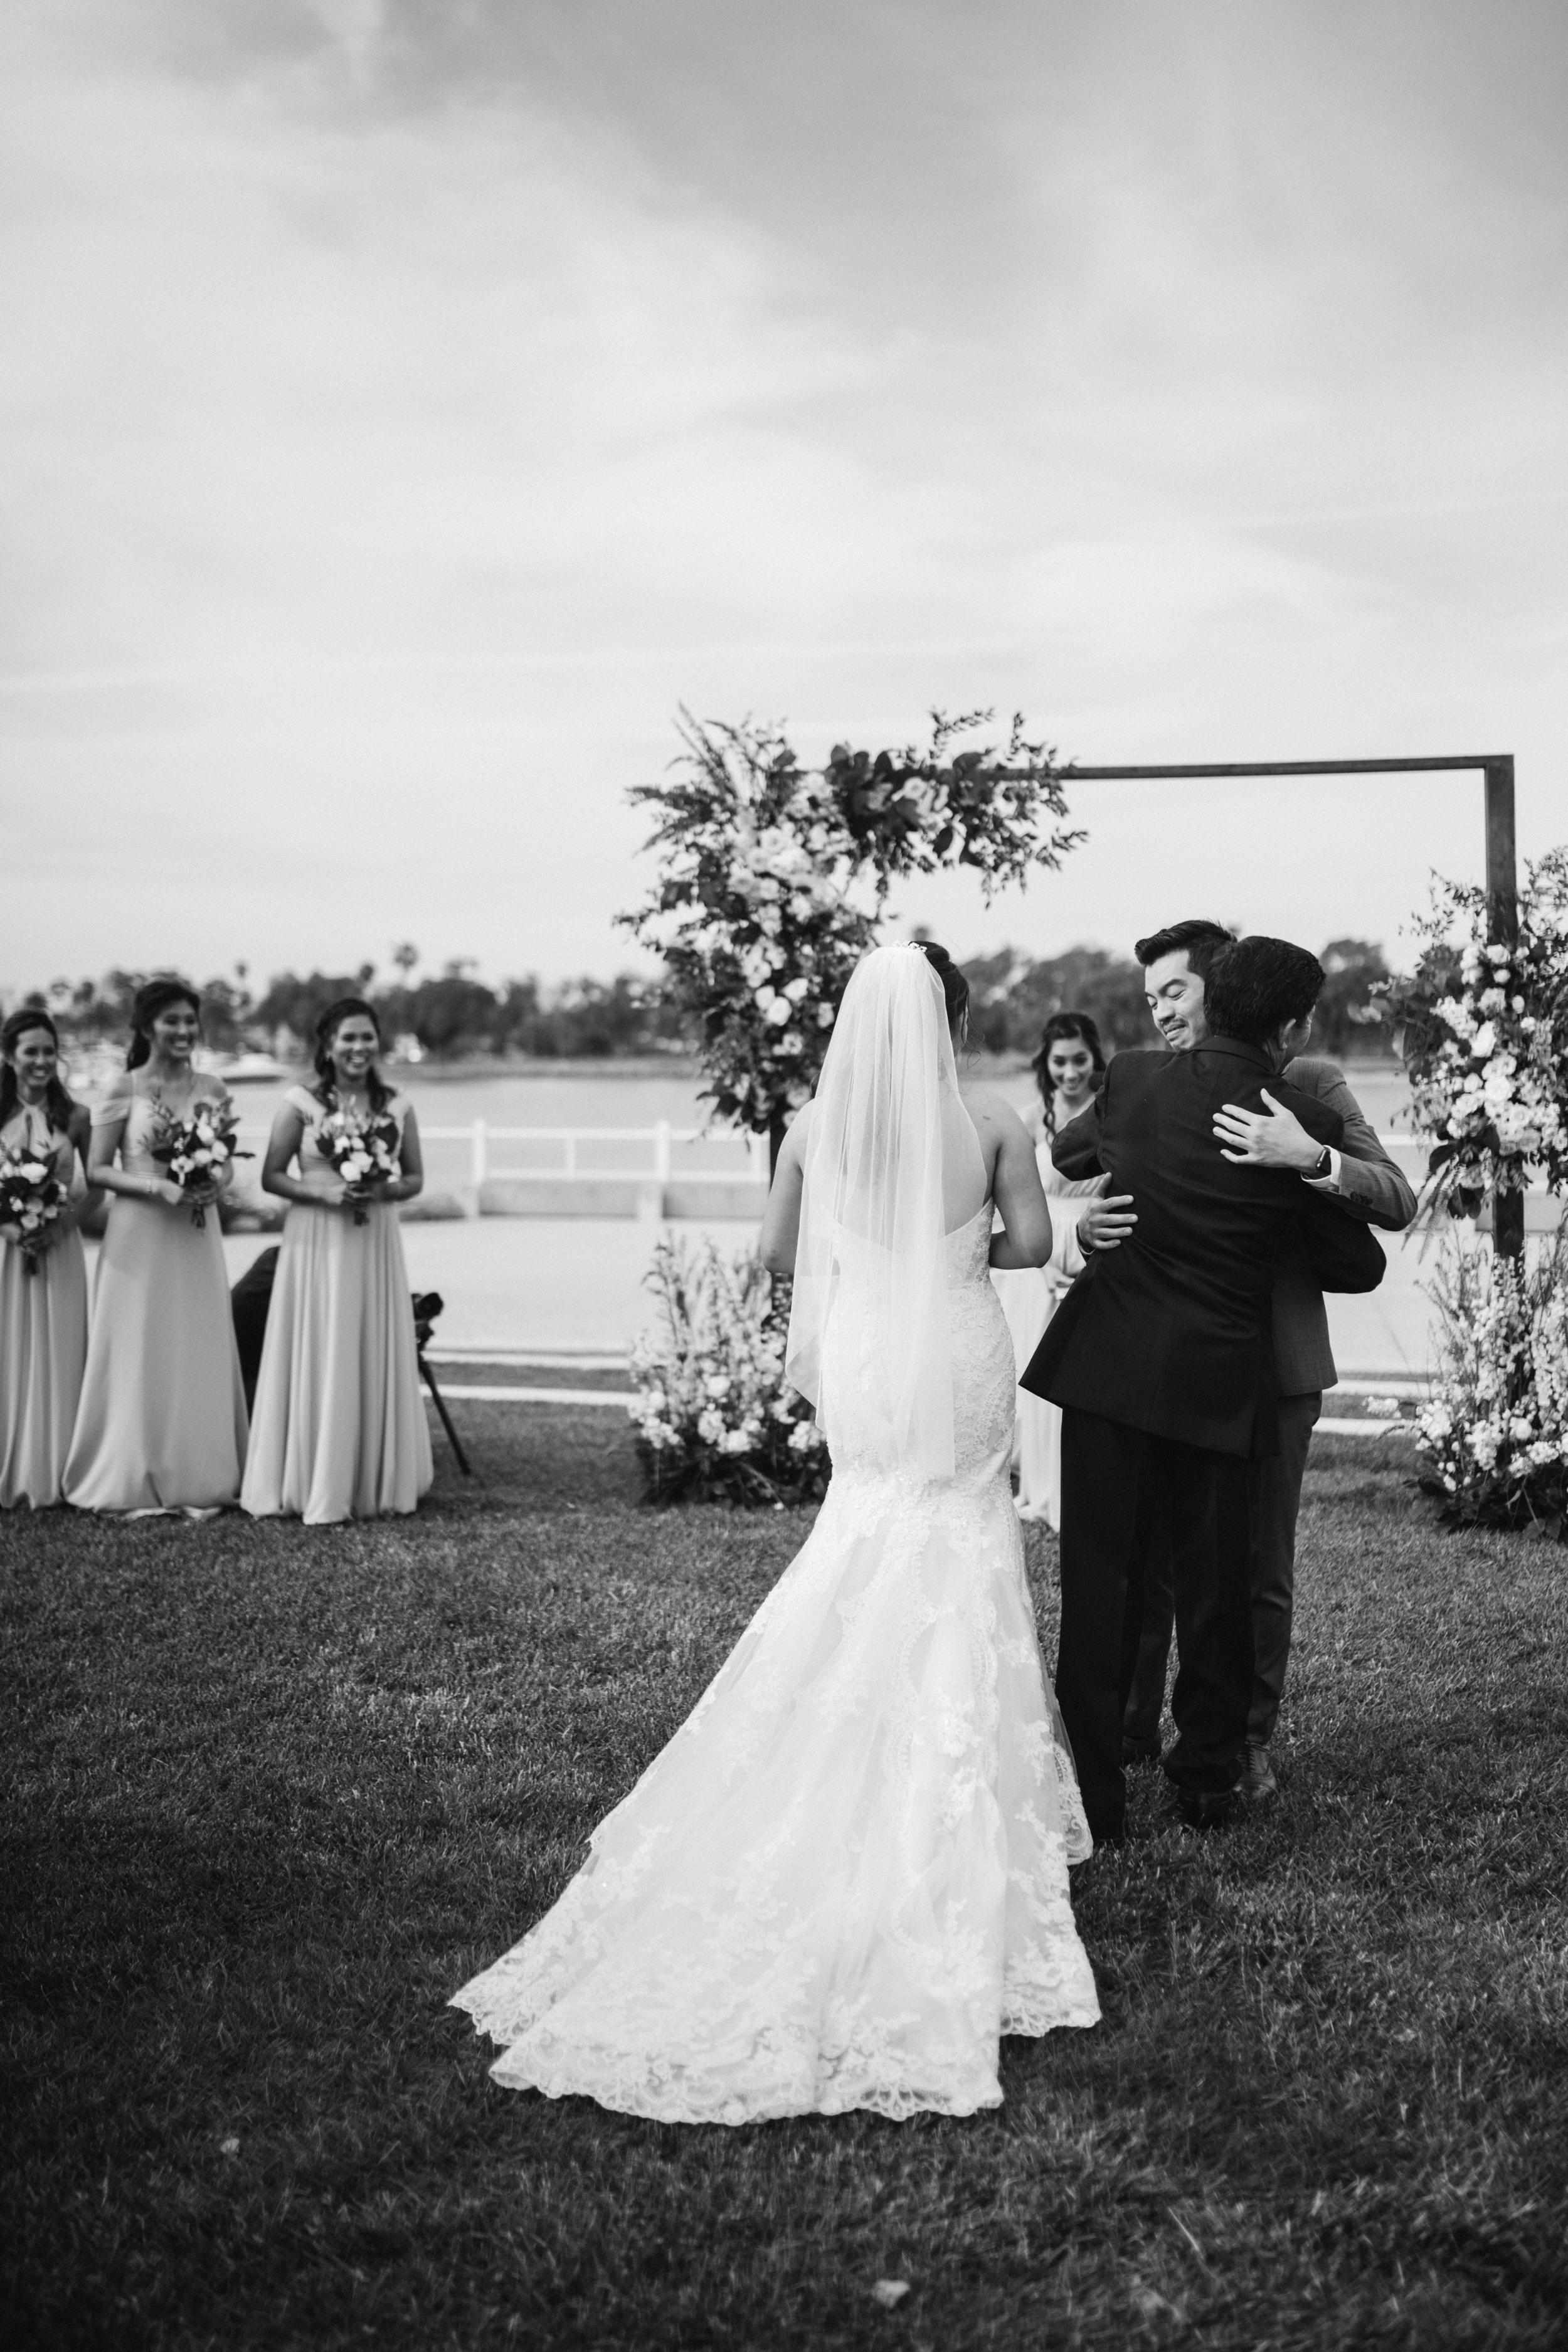 wedding_coronado_community_center-22.jpg